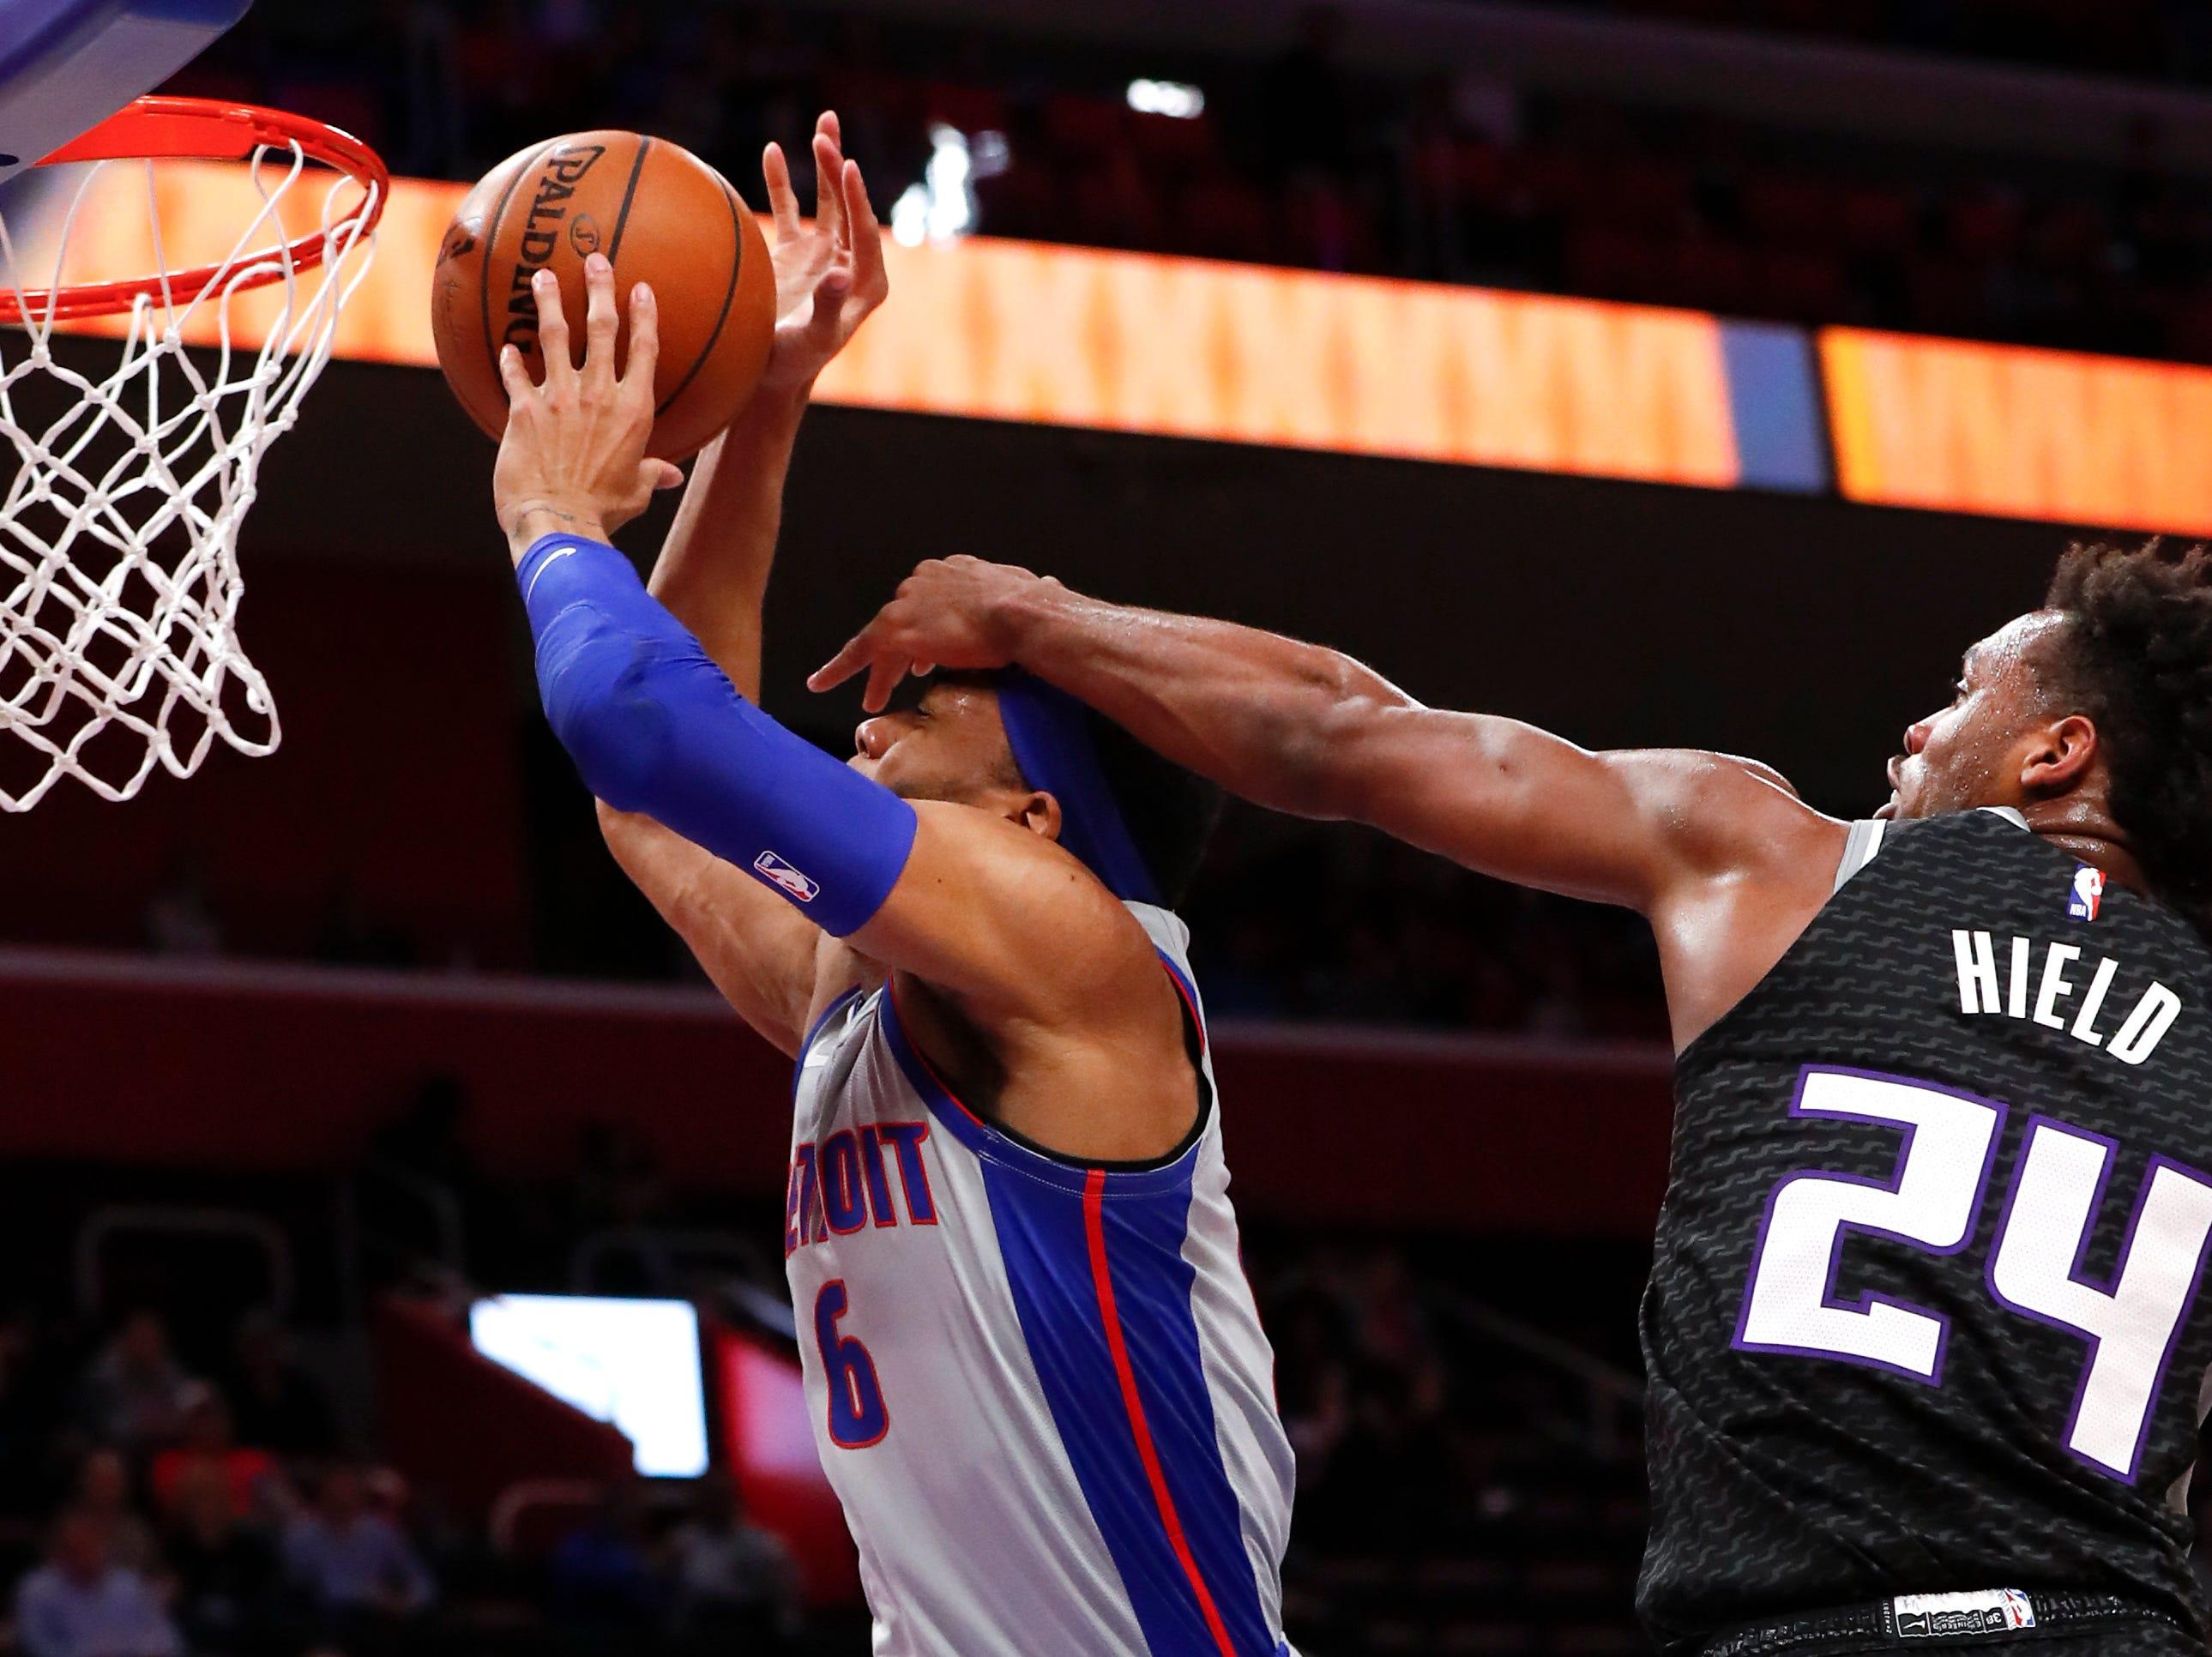 Sacramento Kings guard Buddy Hield (24) fouls Detroit Pistons guard Kalin Lucas (6) in the first half of an NBA basketball game in Detroit, Saturday, Jan. 19, 2019.